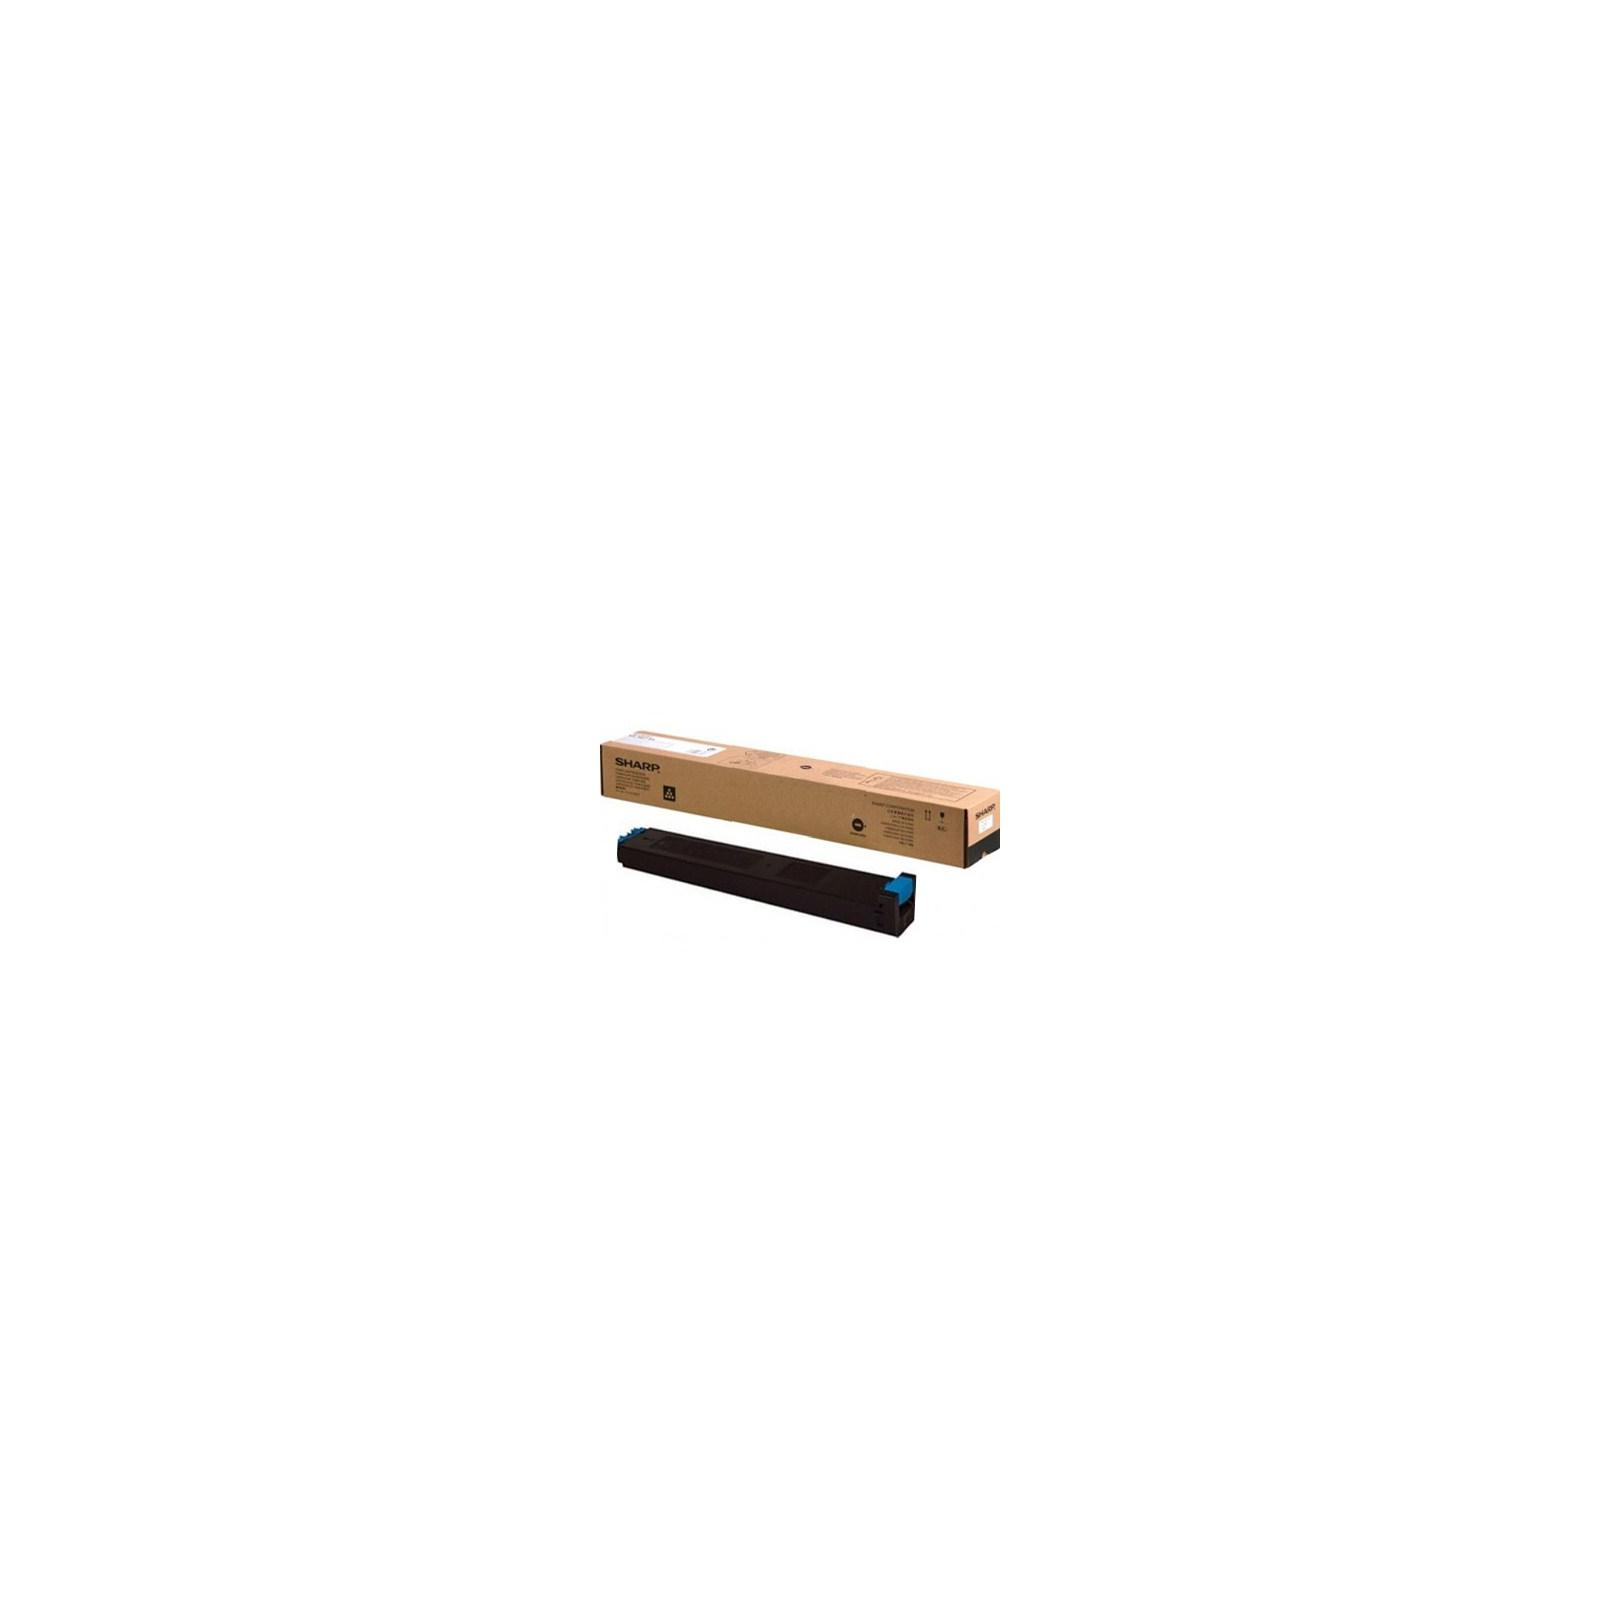 Тонер-картридж SHARP MX36GTCA (15K) Cyan MX-2610N/3110N (MX-36GTCA)